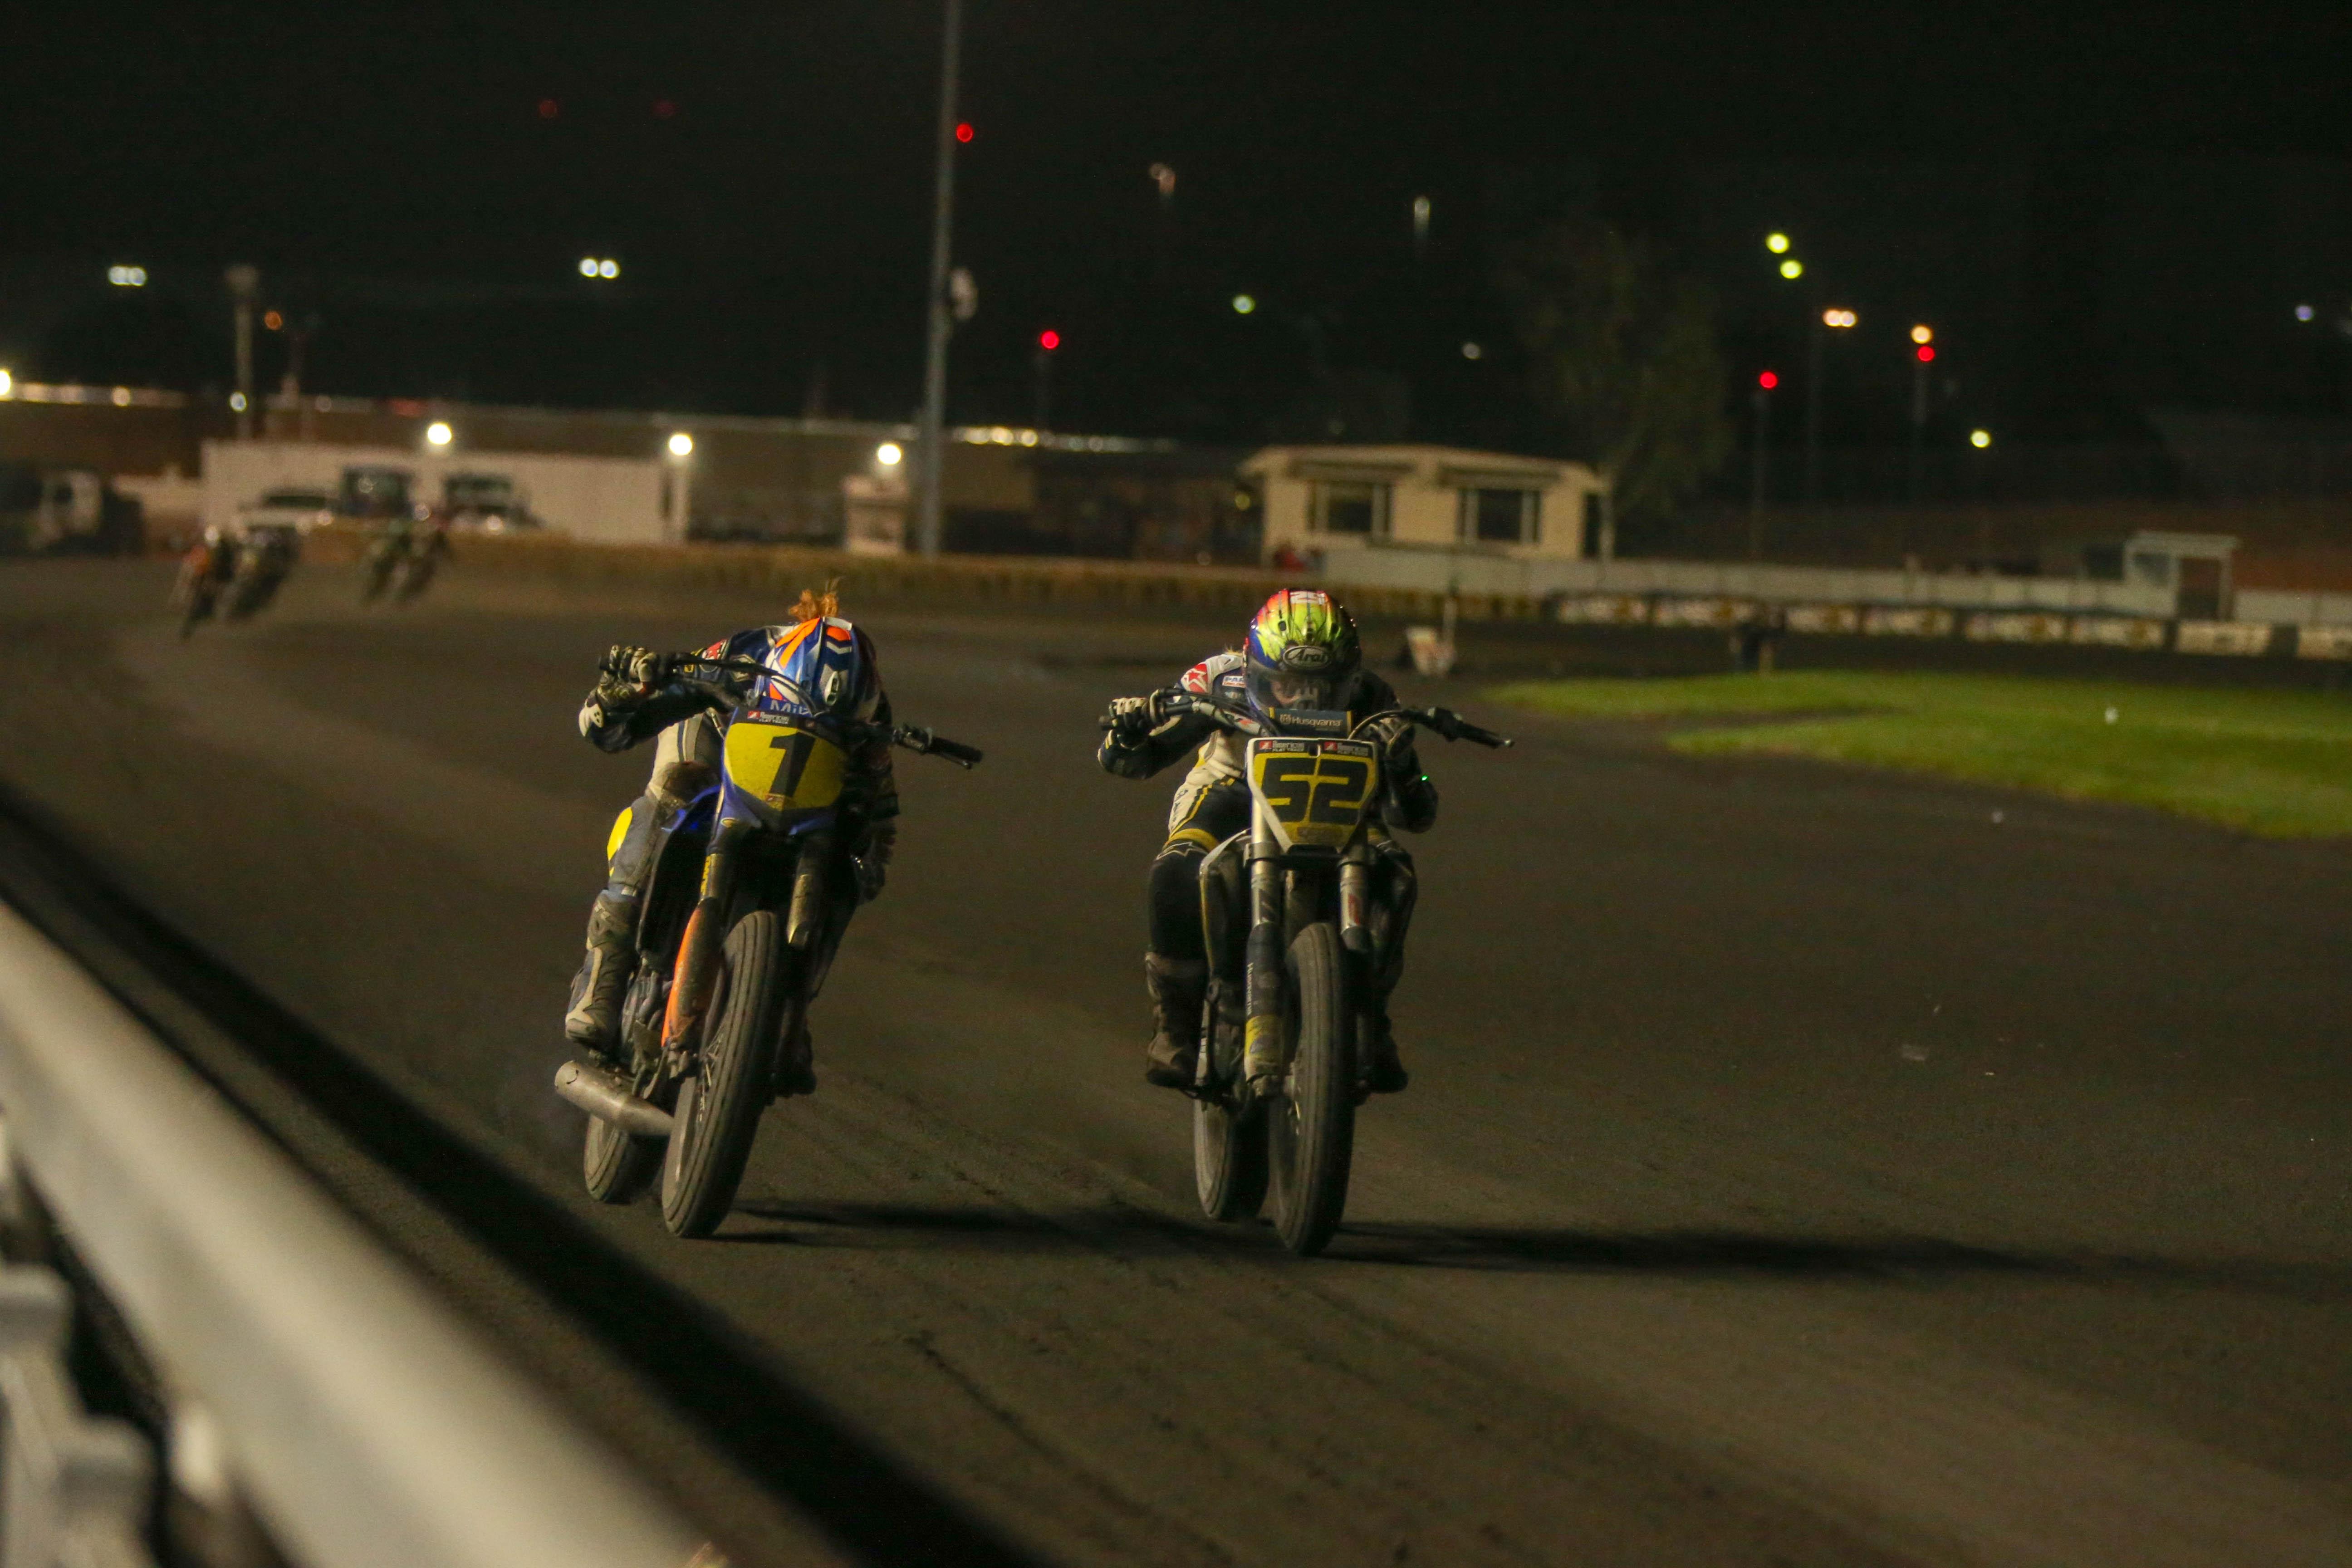 Meadowlands Mile Presented By Ducati